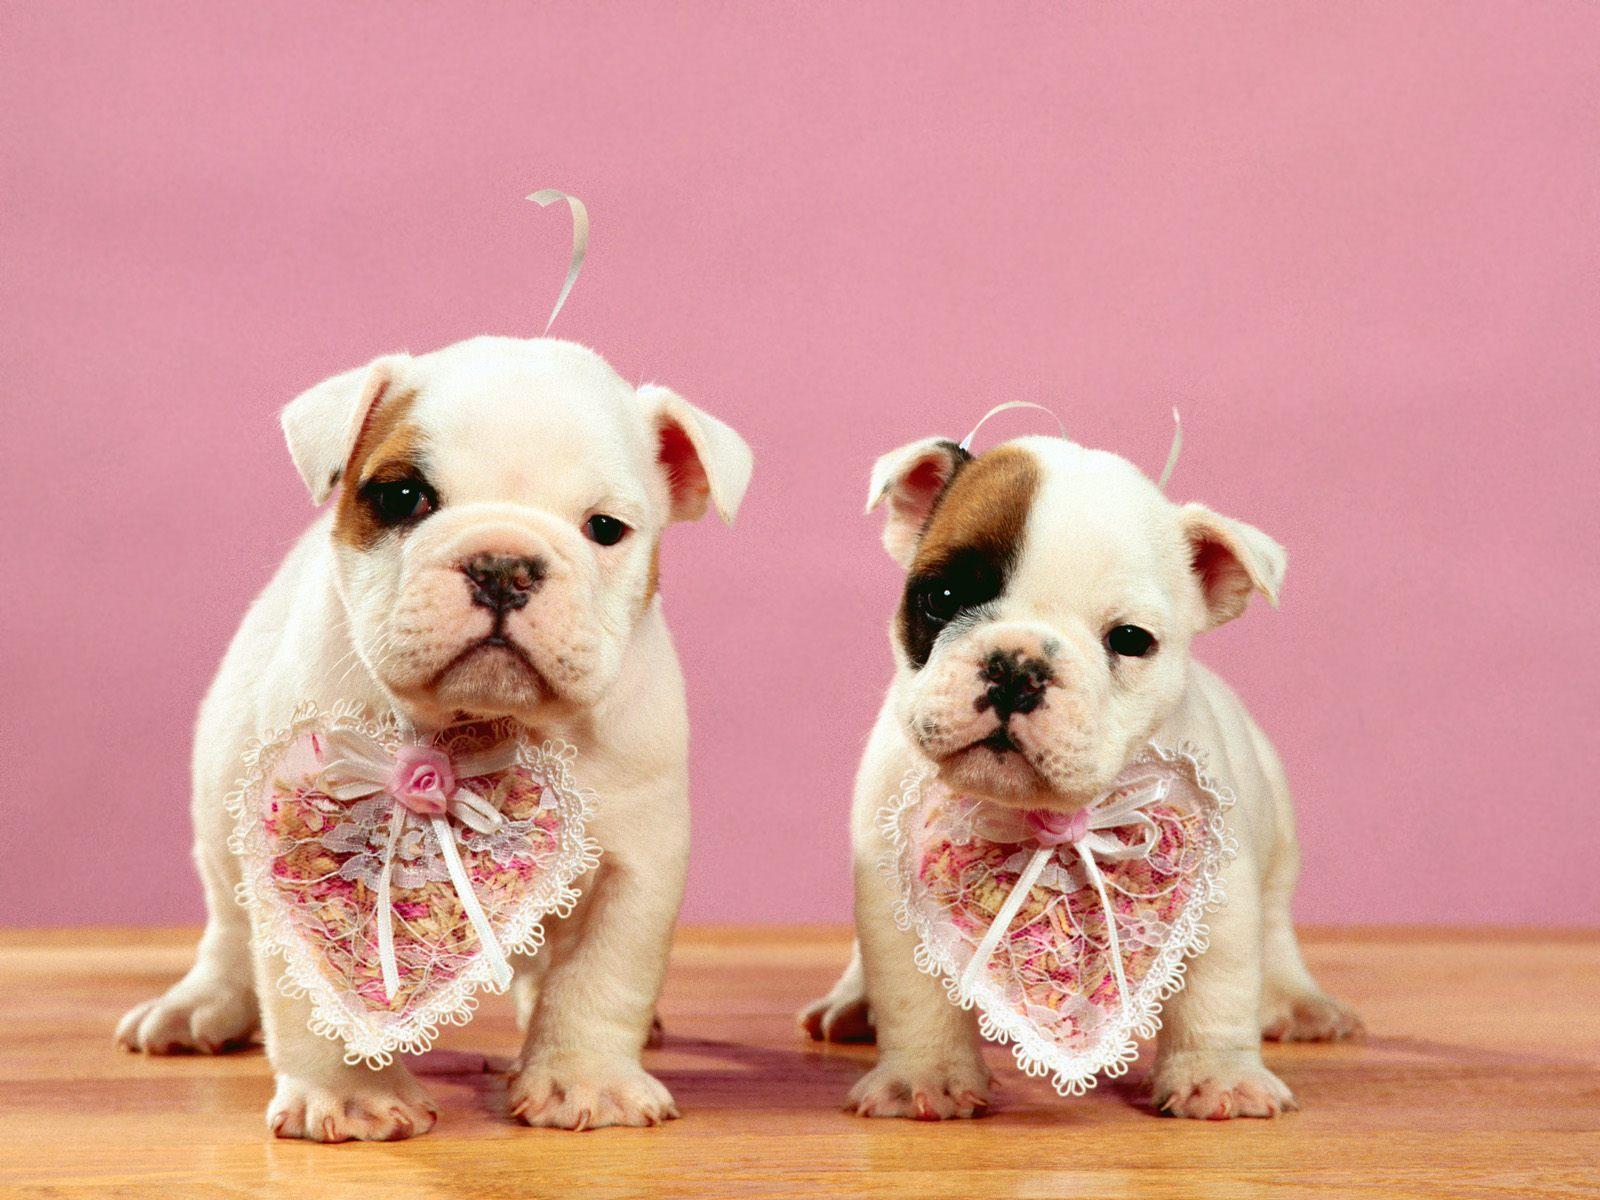 http://1.bp.blogspot.com/-BYZb9BPb4Oc/TVle8SiCfrI/AAAAAAAAAEo/ZUK2UH__rwc/s1600/Be+Our+Valentines_.jpg